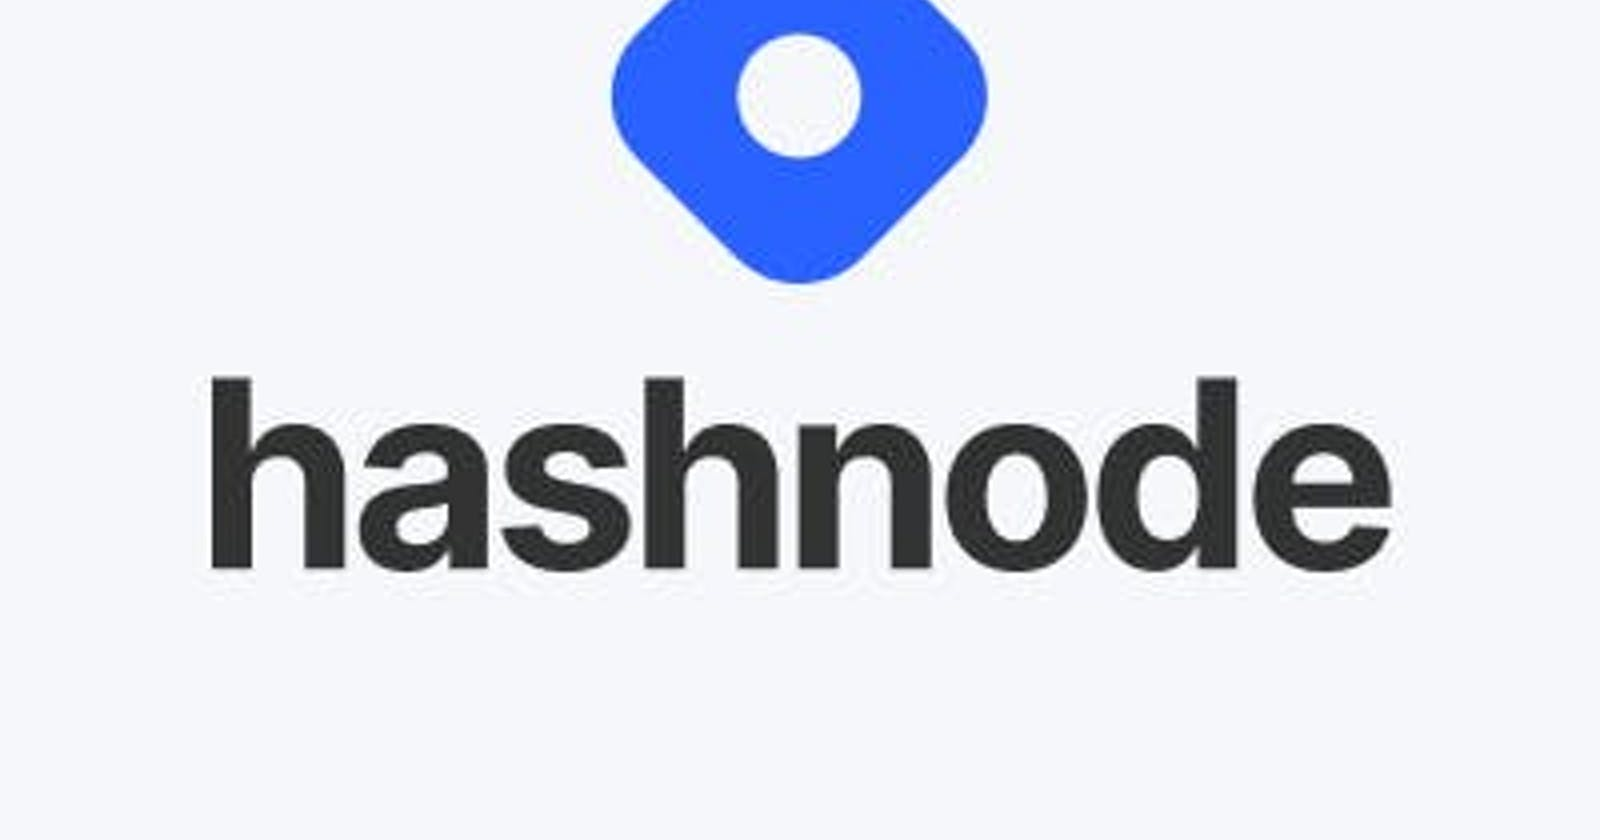 Moving my blog to Hashnode